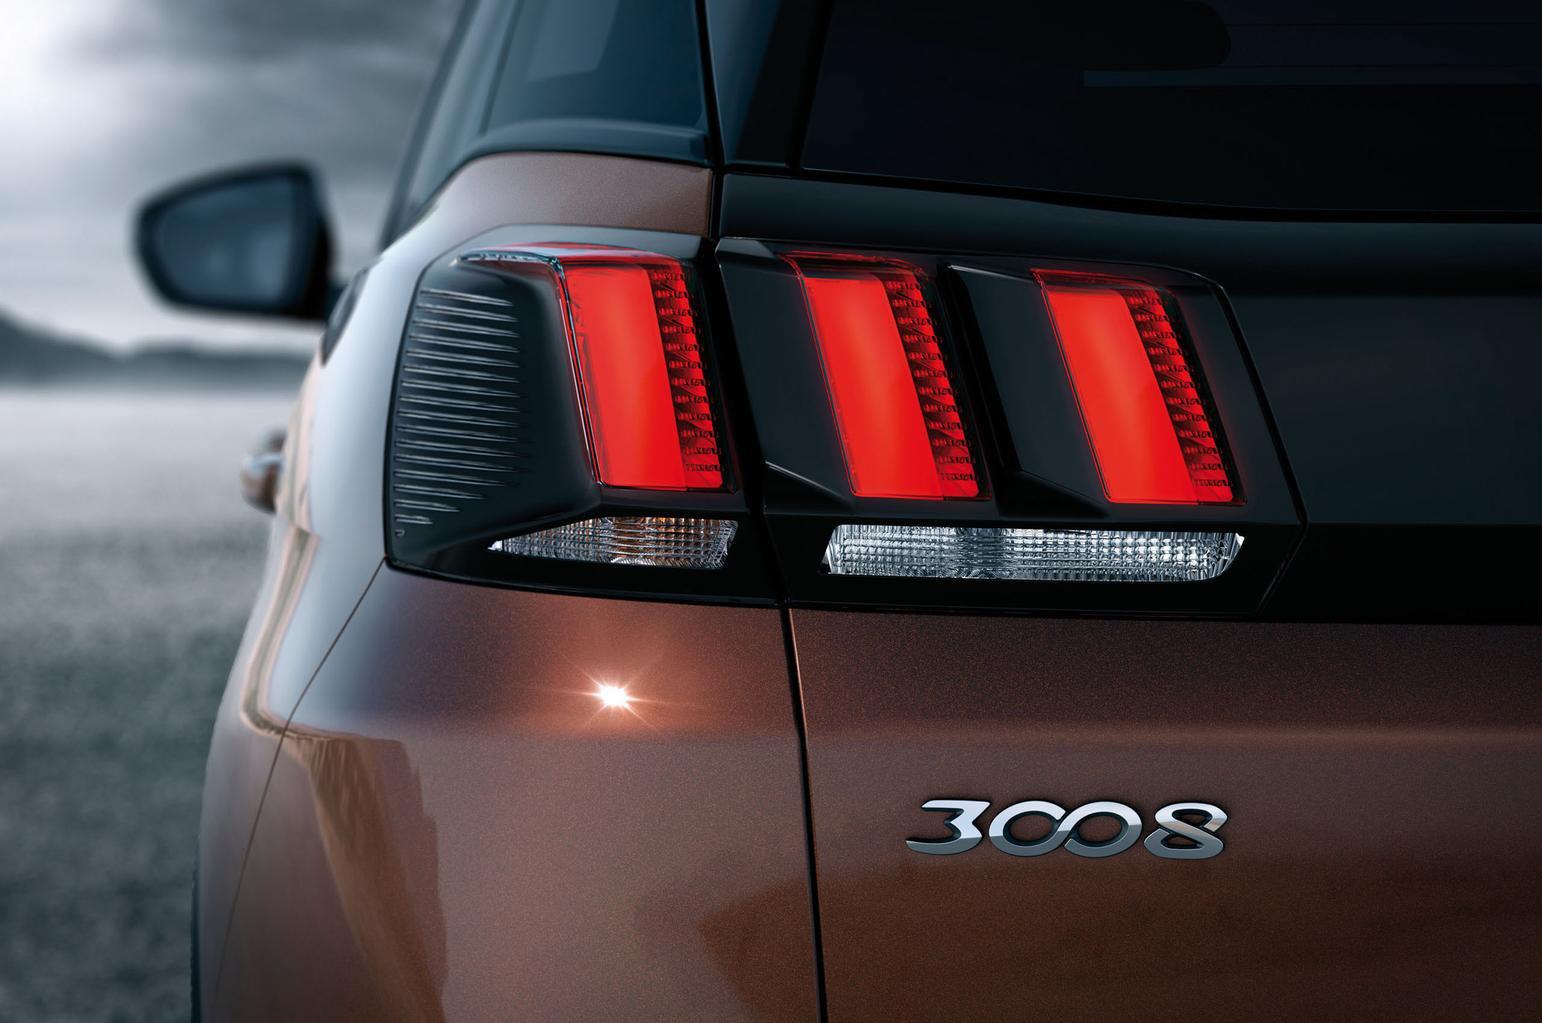 New Peugeot 3008 revealed